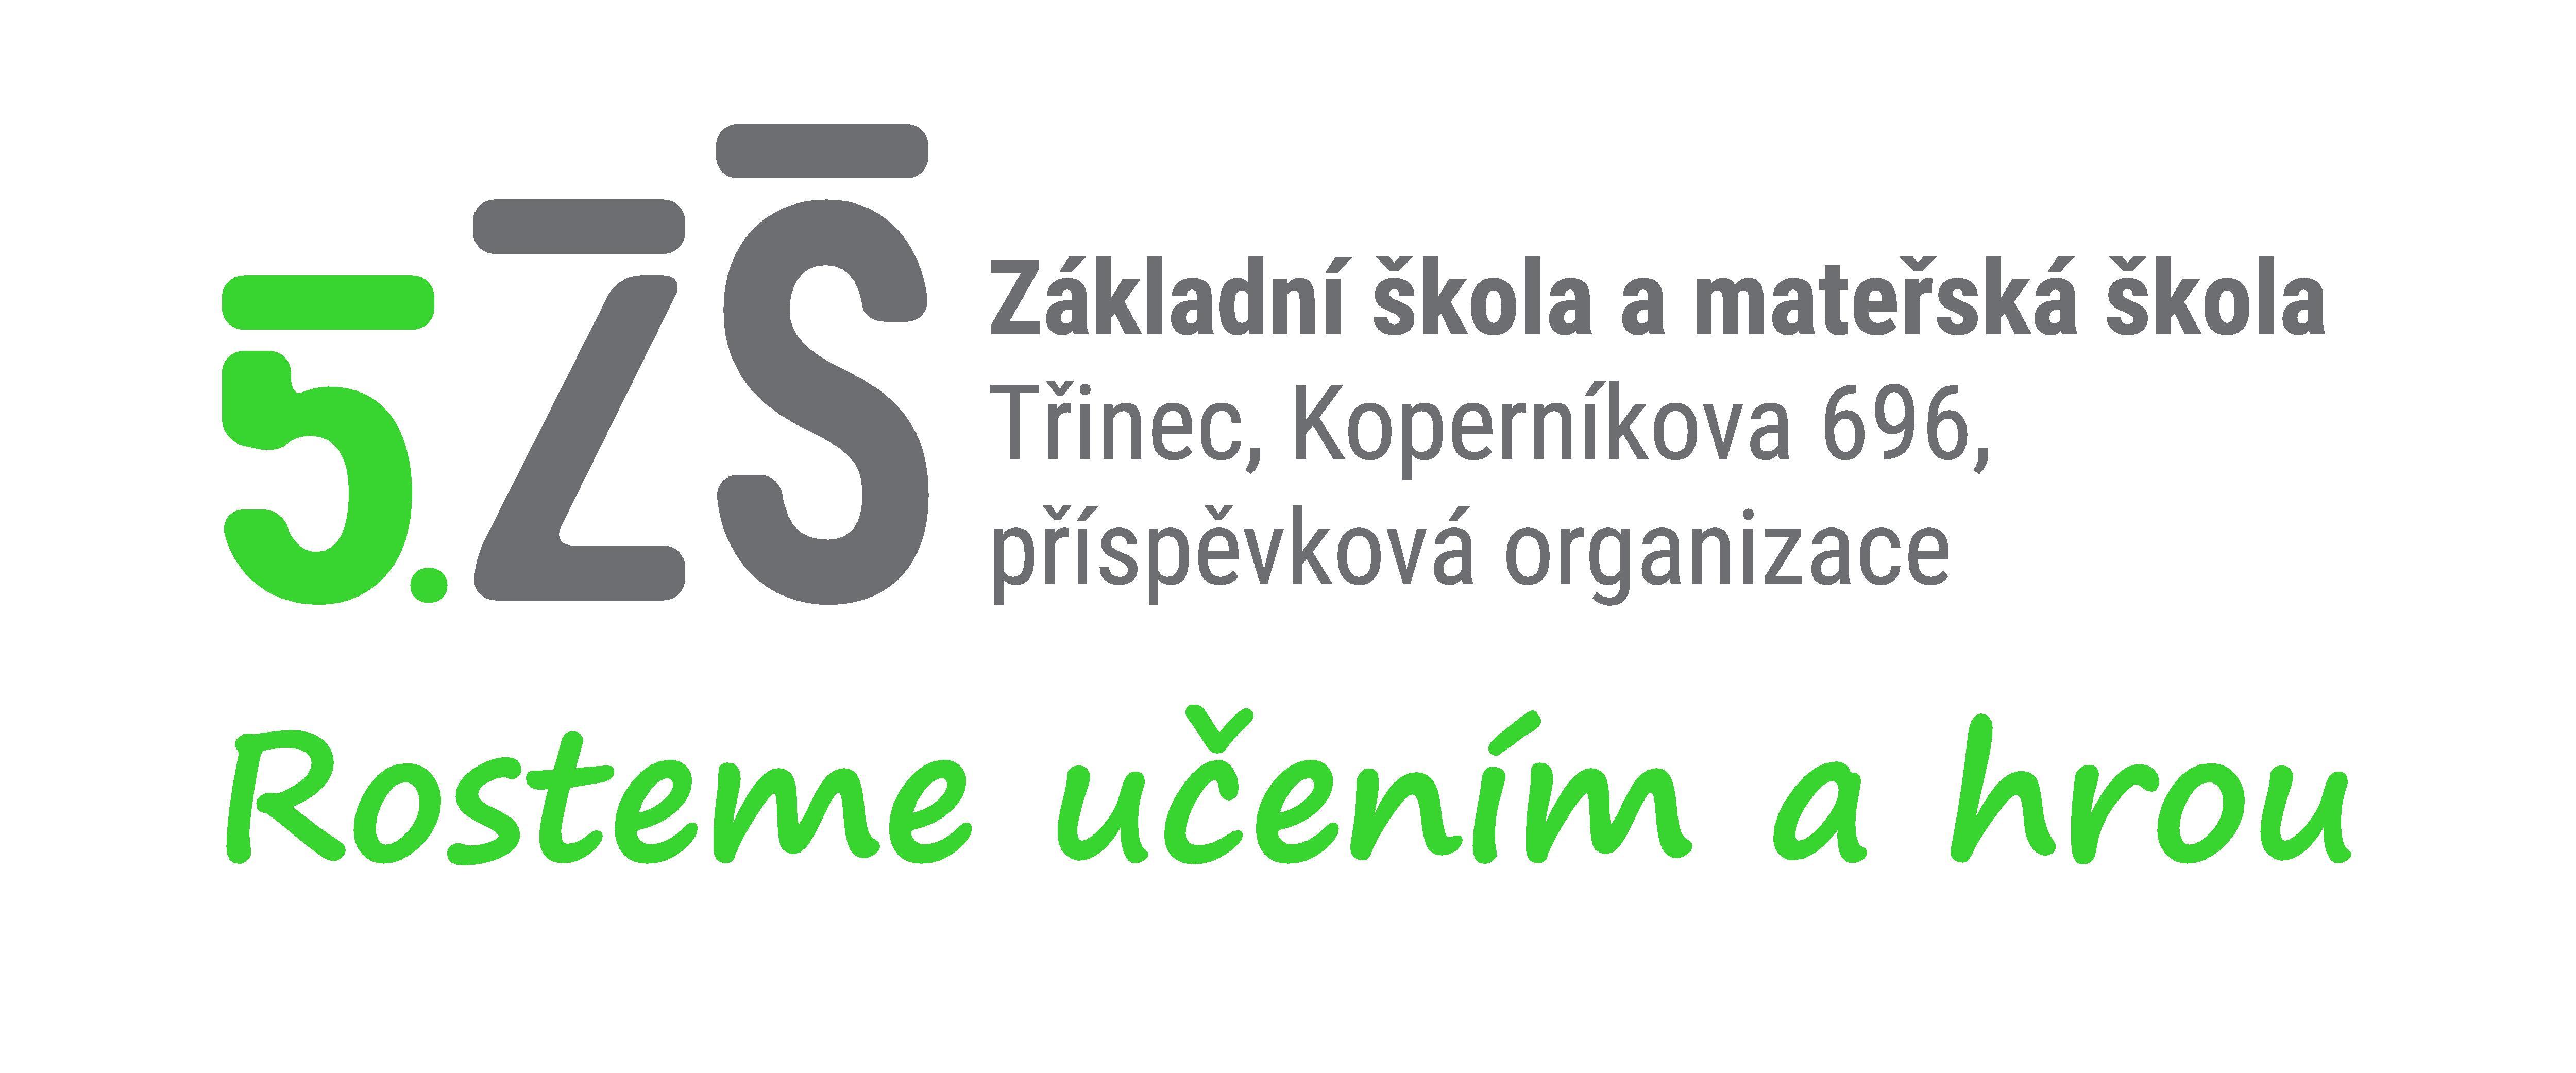 5ZS-Trinec